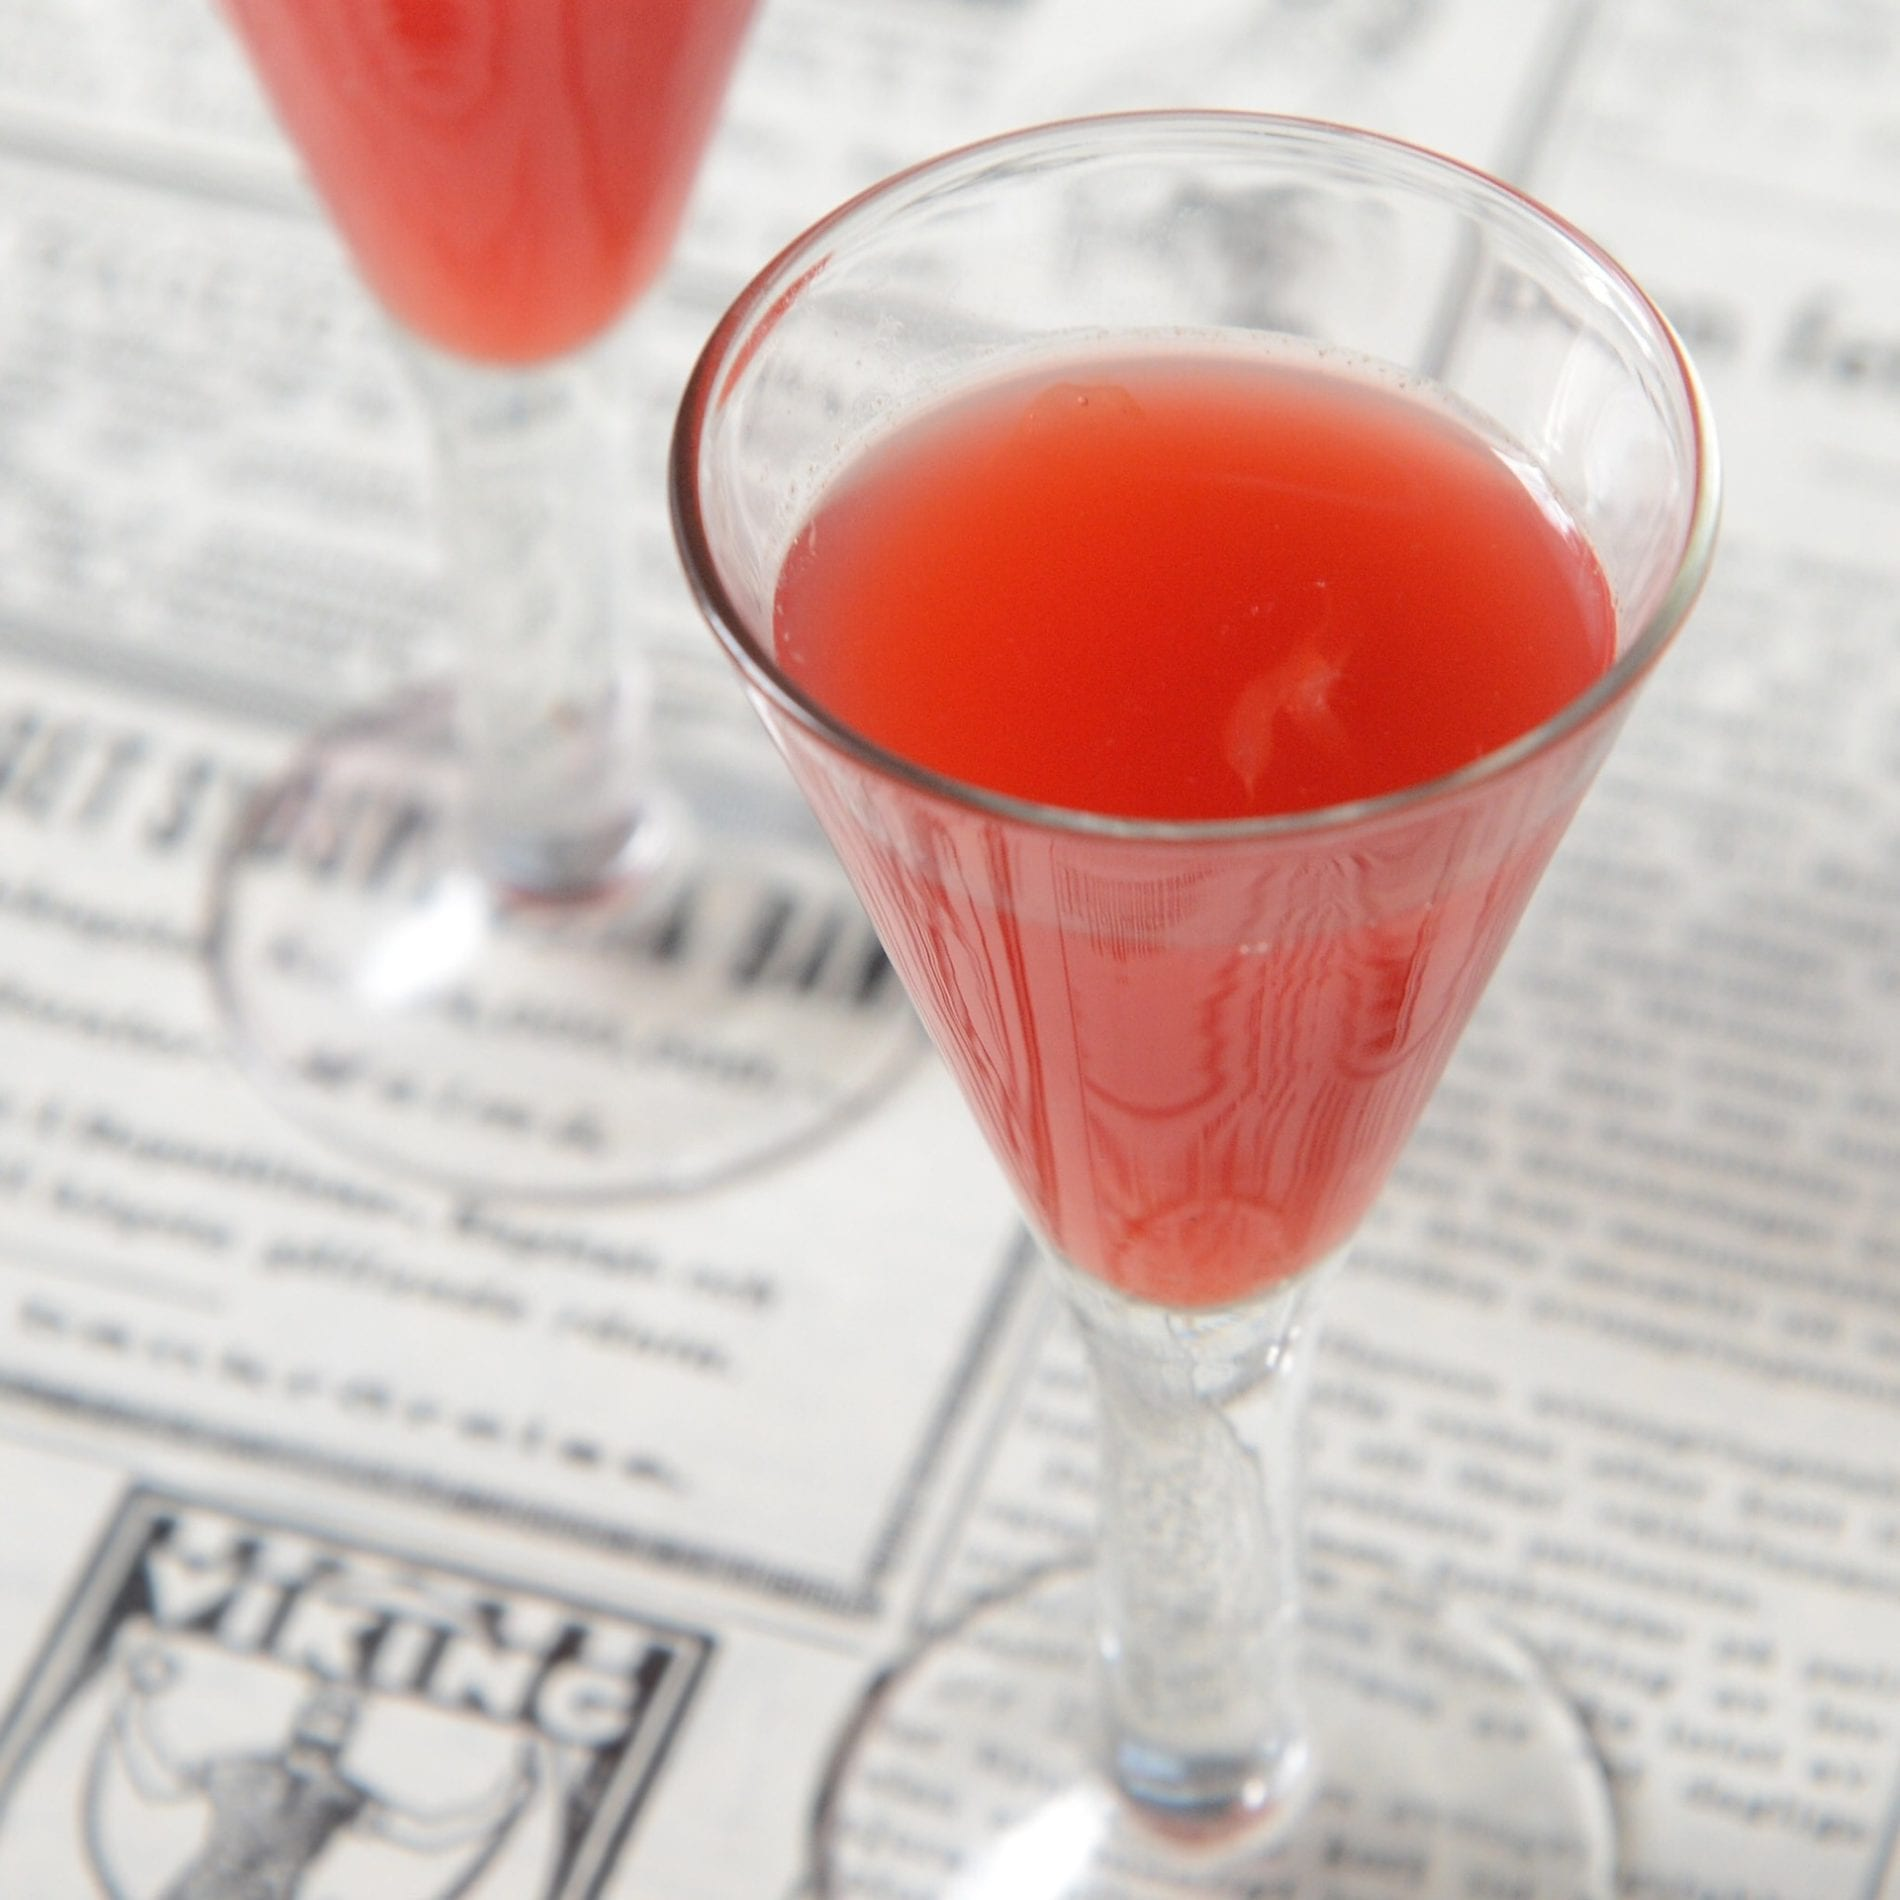 bloody berry juice